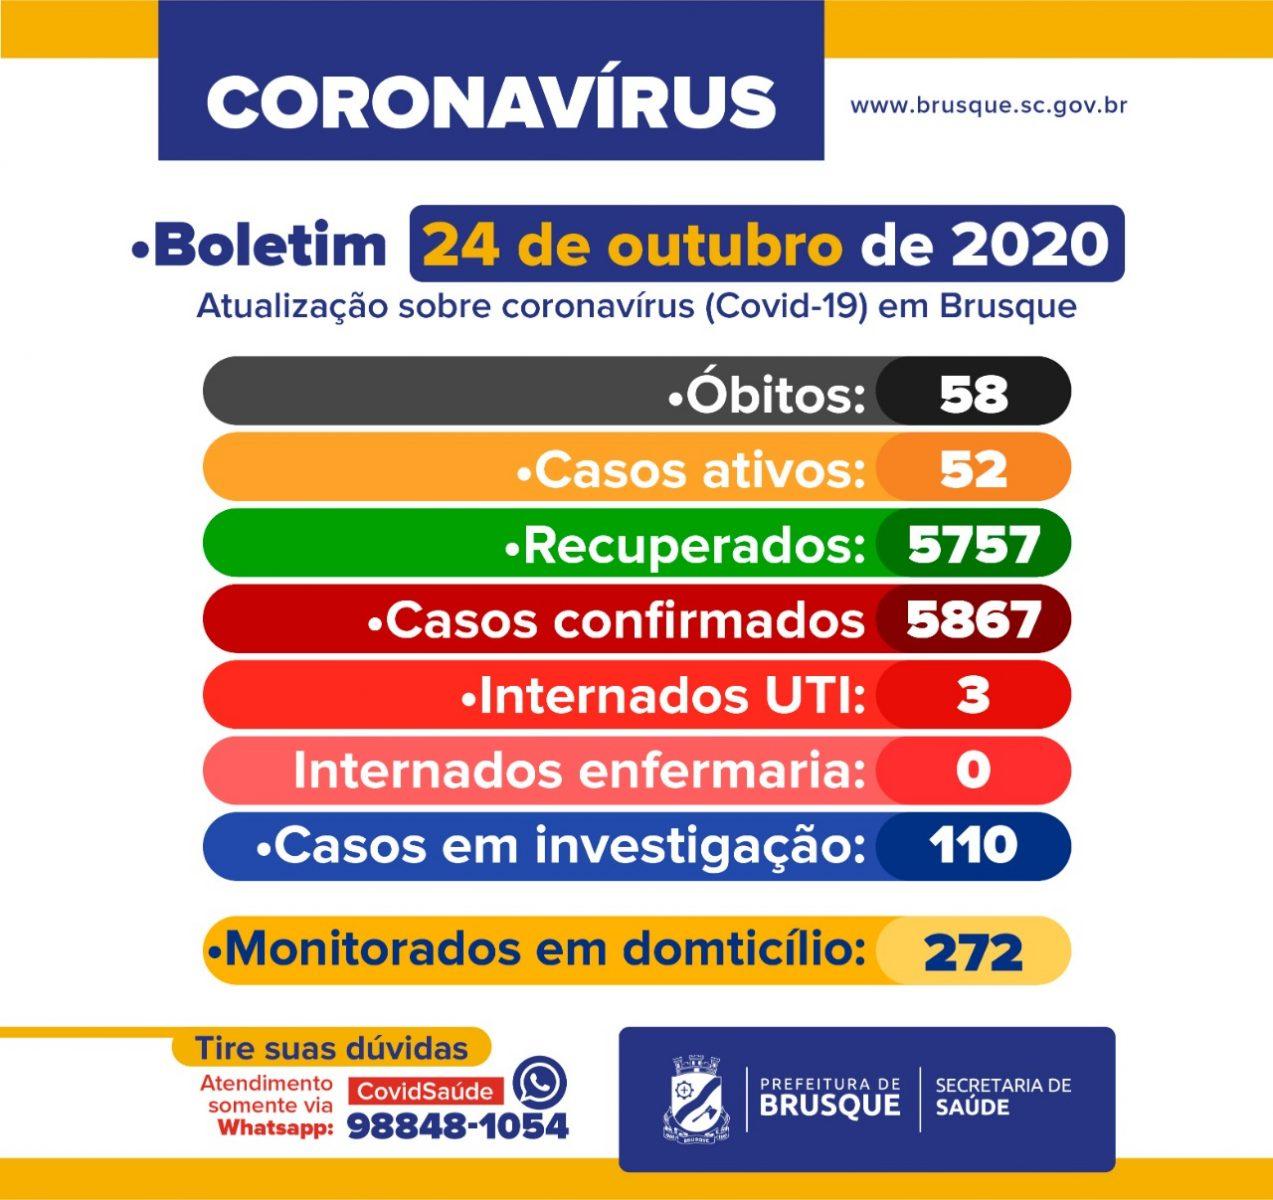 COVID-19: Boletim epidemiológico 24 de outubro